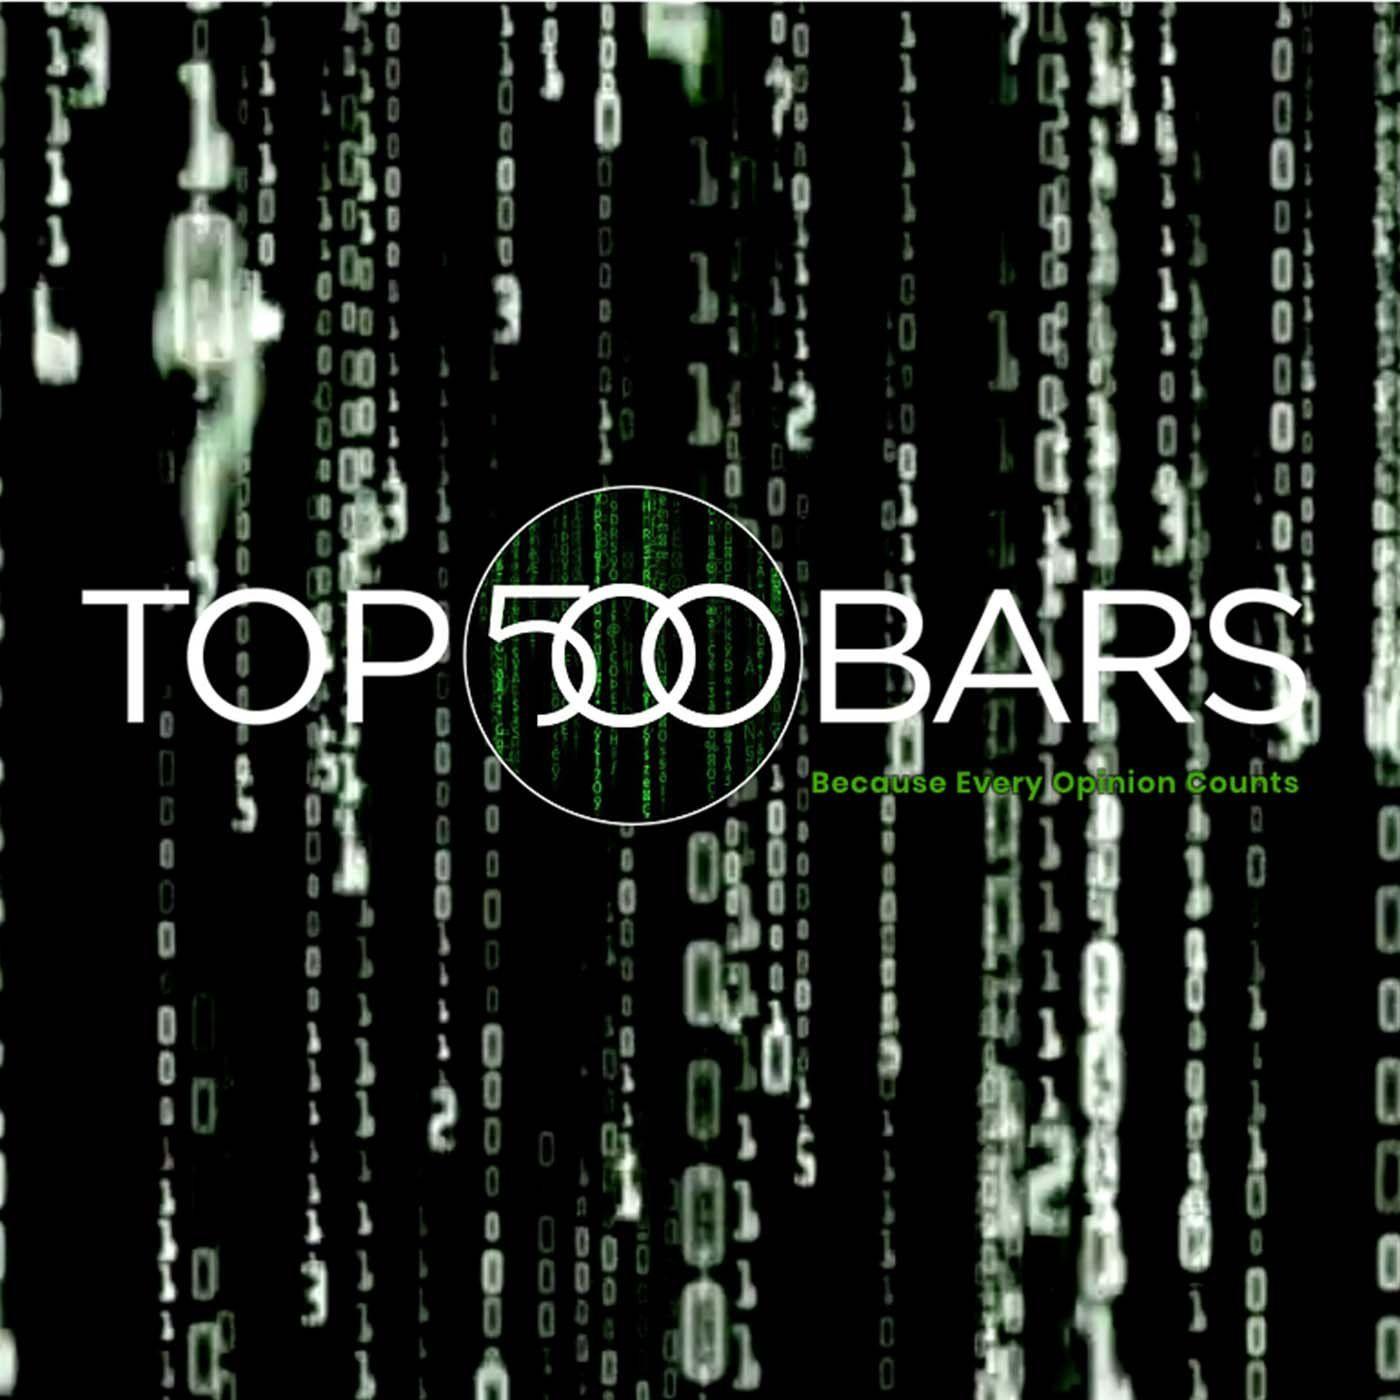 Podcast Infosbar Inside #11- Le 1er classement digital  Top 500 bars